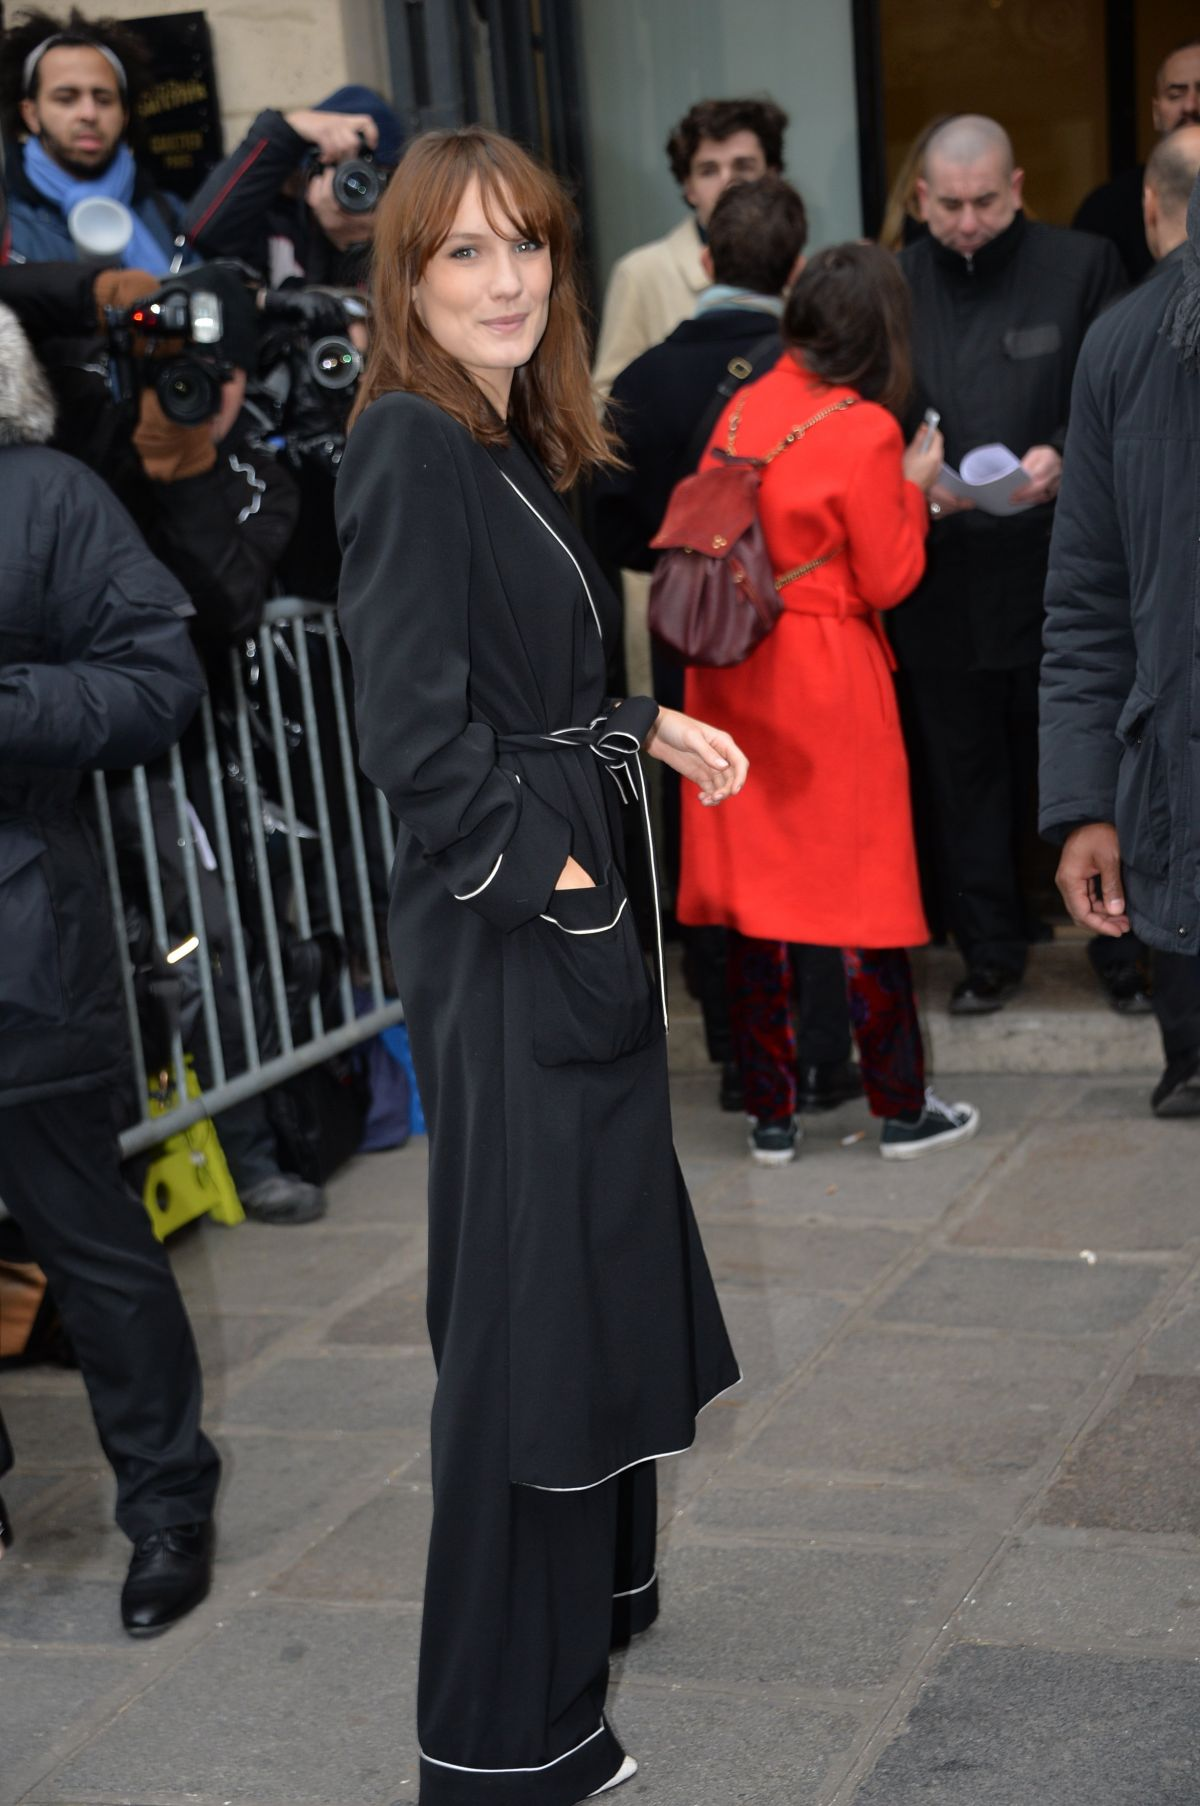 ANA GIRARDOT at Jean-paul Gaultier Fashion Show at Pais Fashion Week 01/25/2017